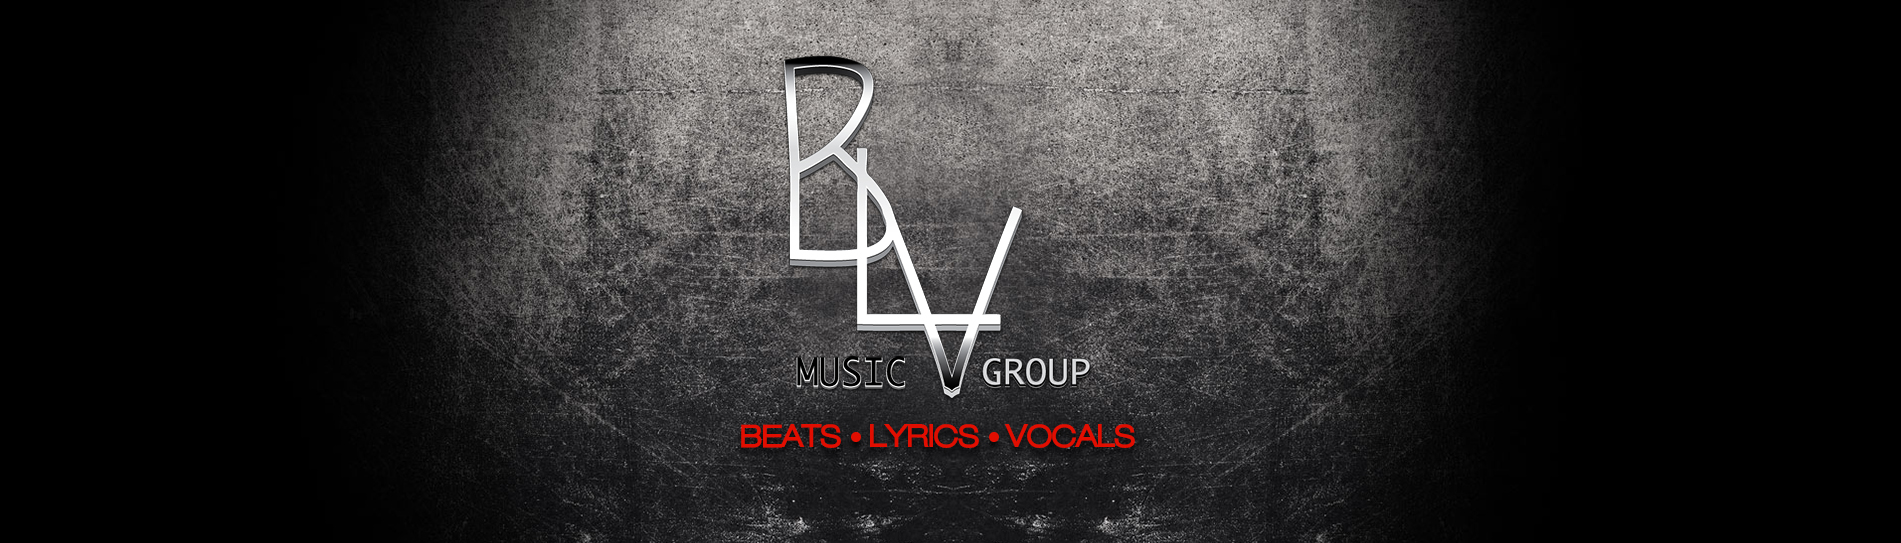 http://www.blvmusicgroup.com/wp-content/uploads/2014/09/BLV-HEADER.jpg